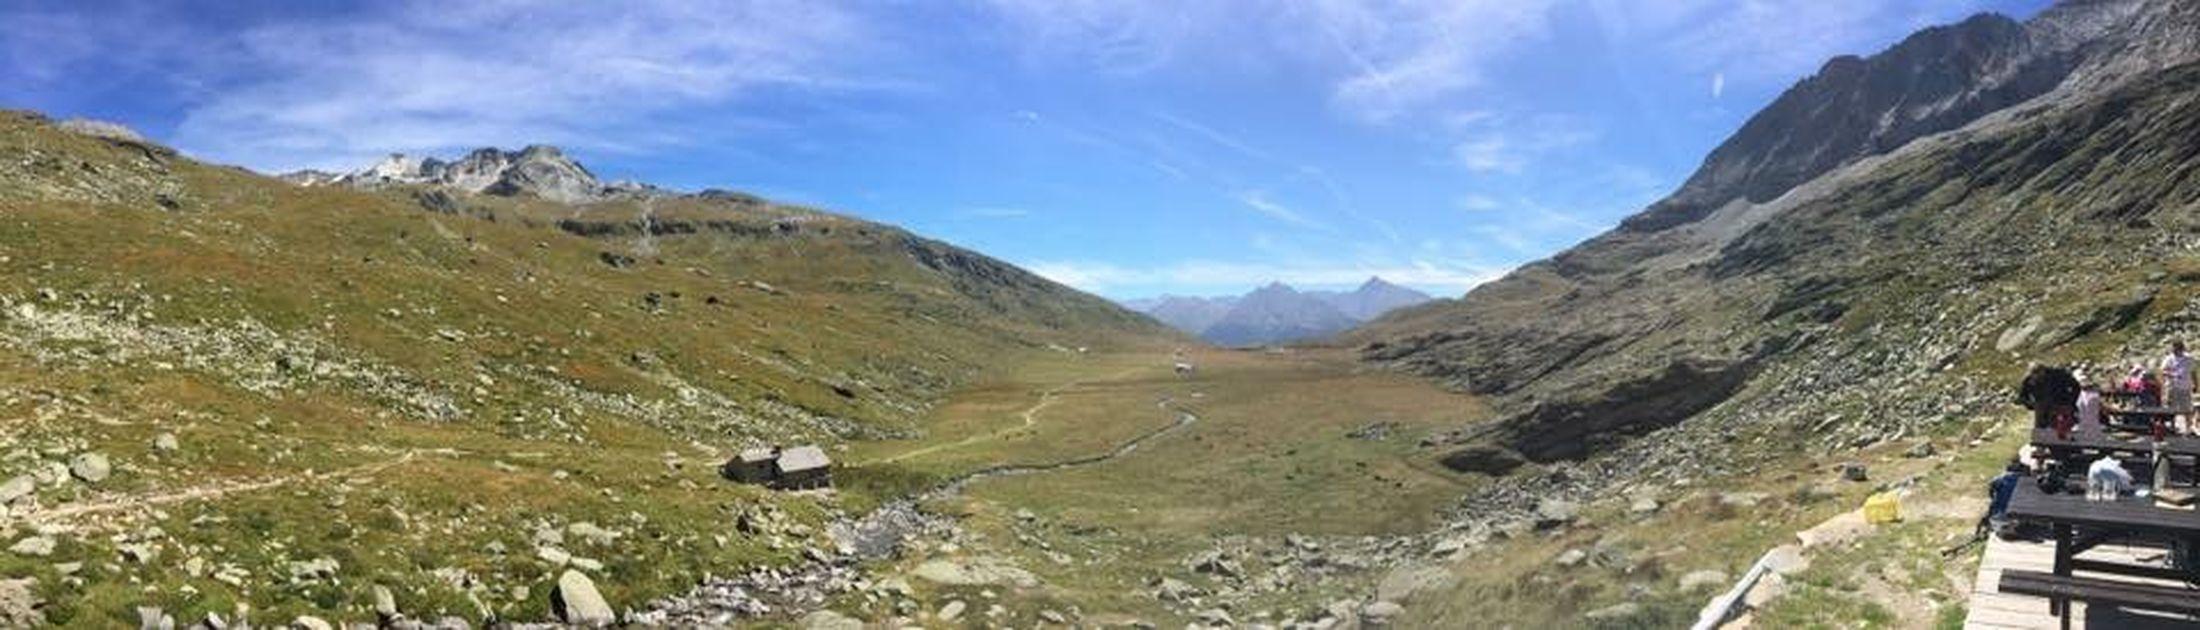 Enjoying Life Balade En Montagne Avecmonchéri Vacances